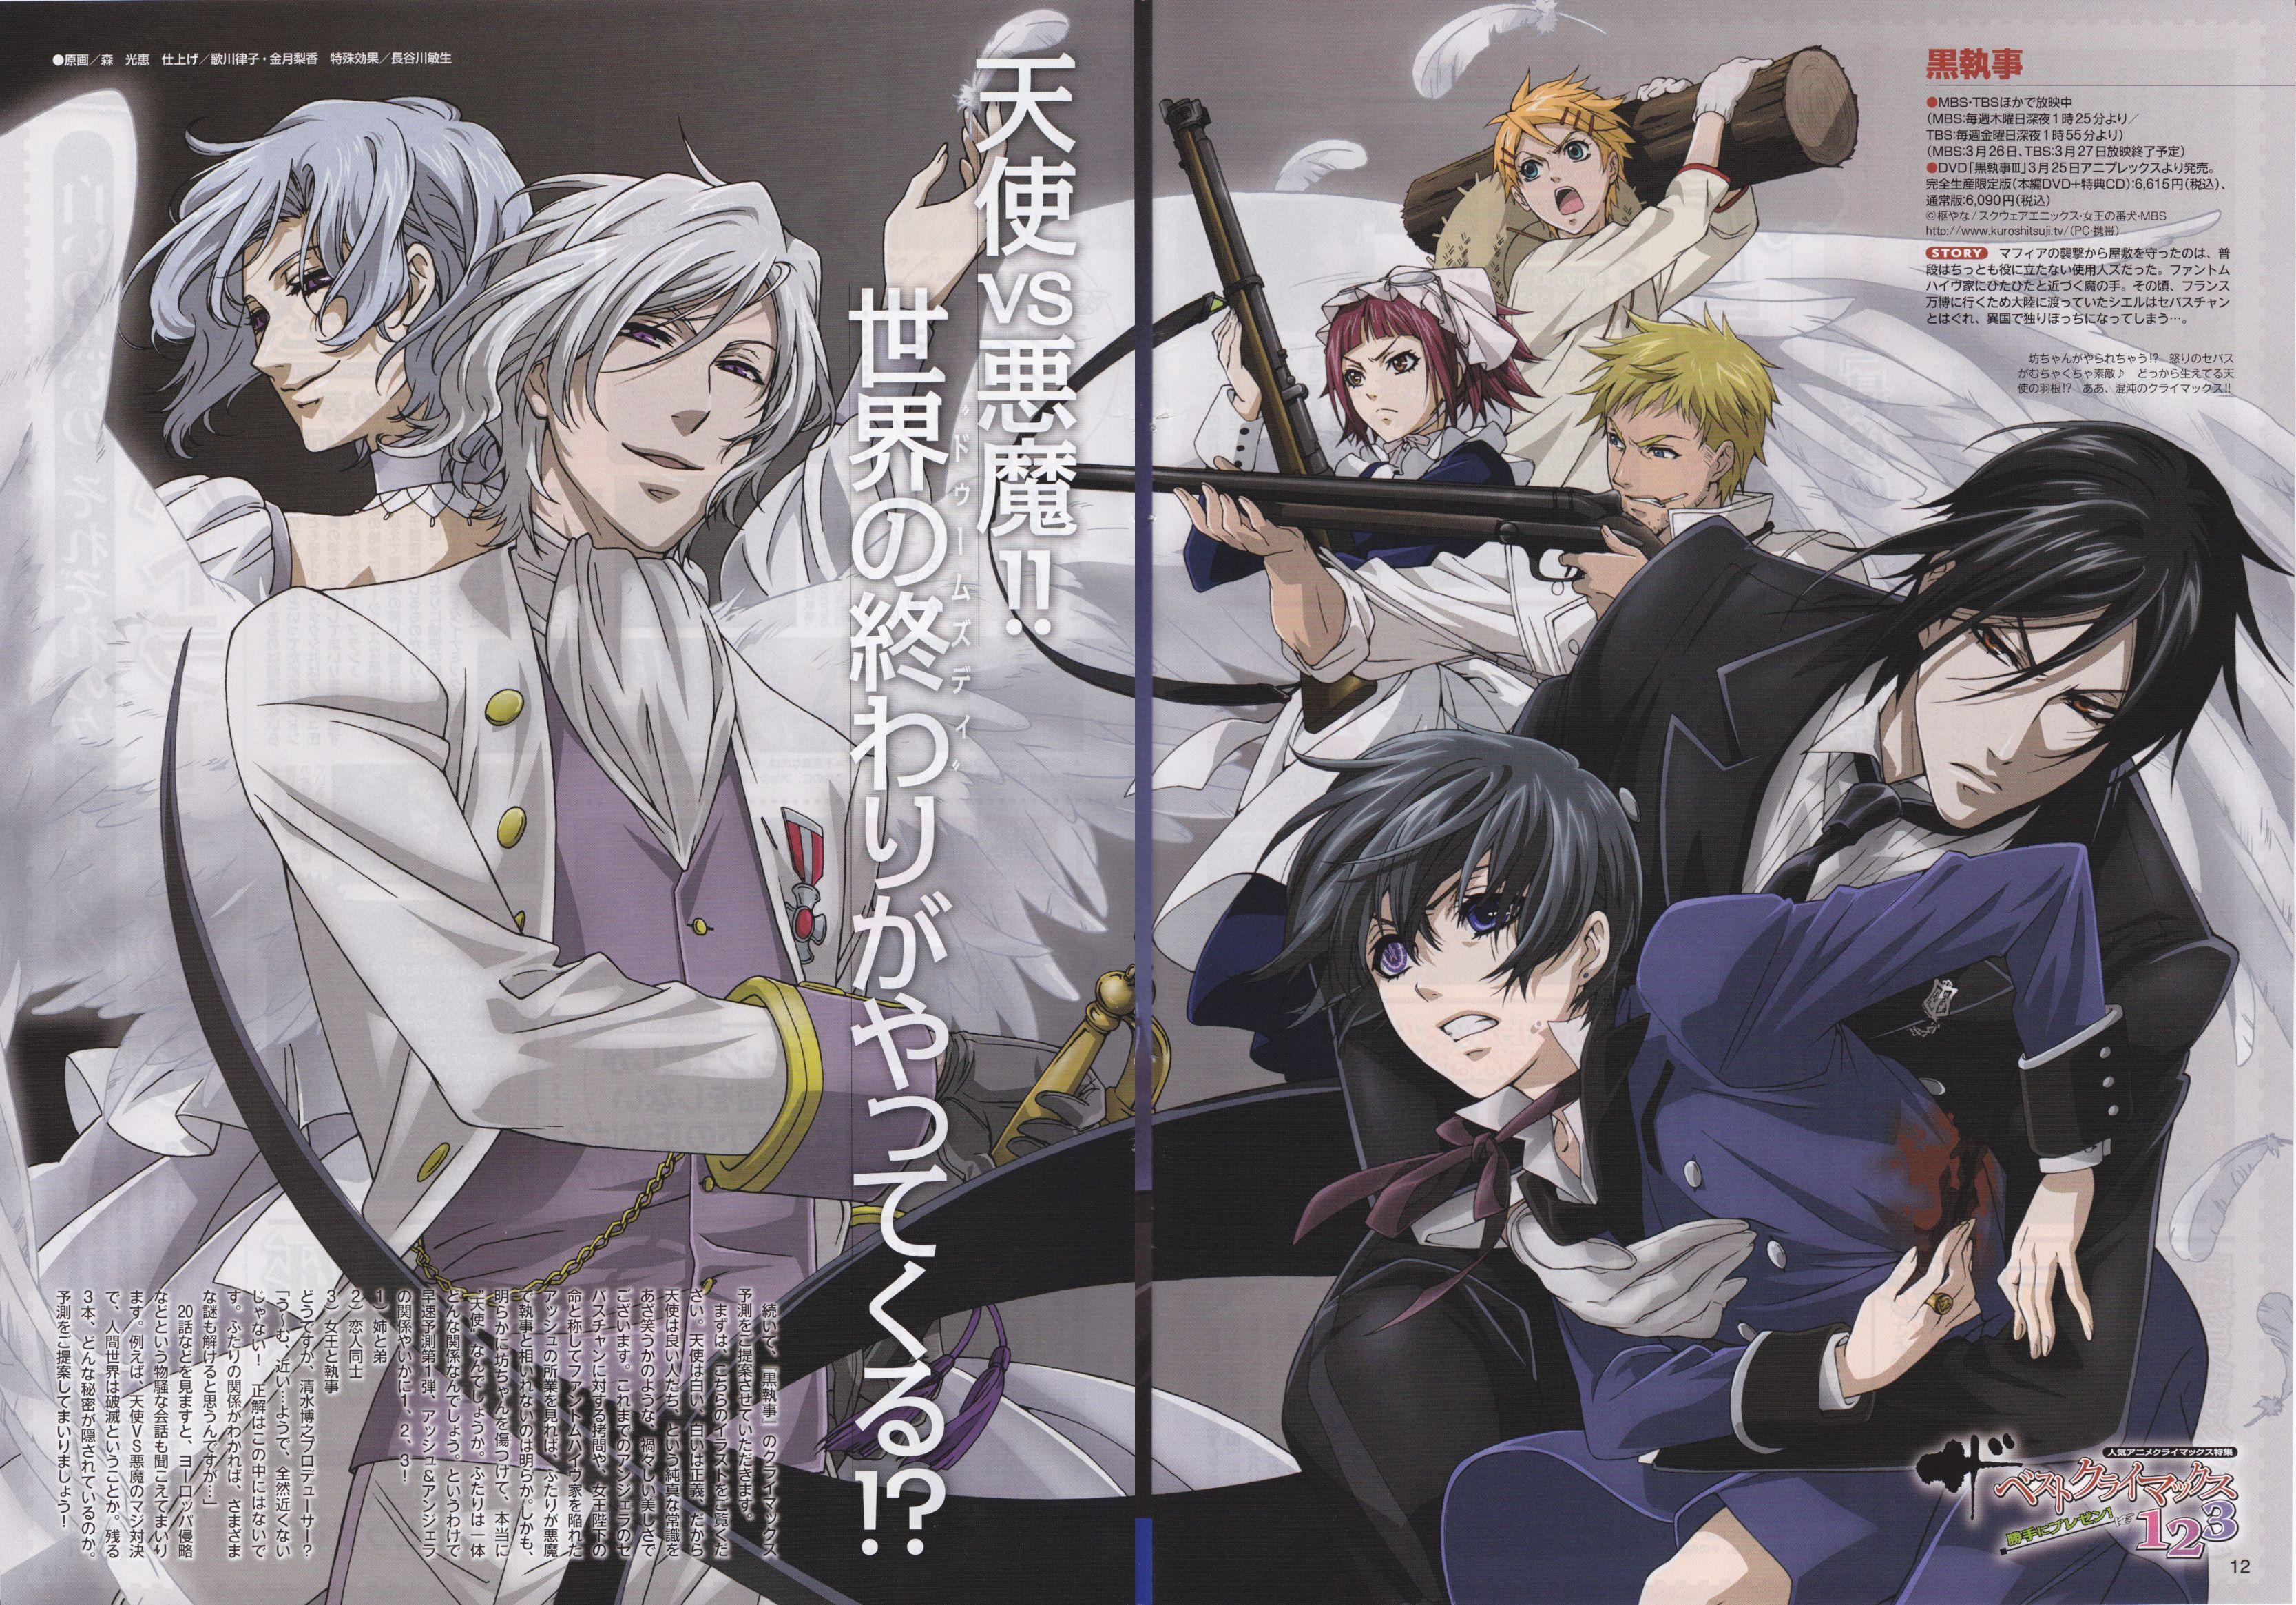 Kuroshitsuji iphone wallpaper tumblr - Black Butler The Angel Of Massacre